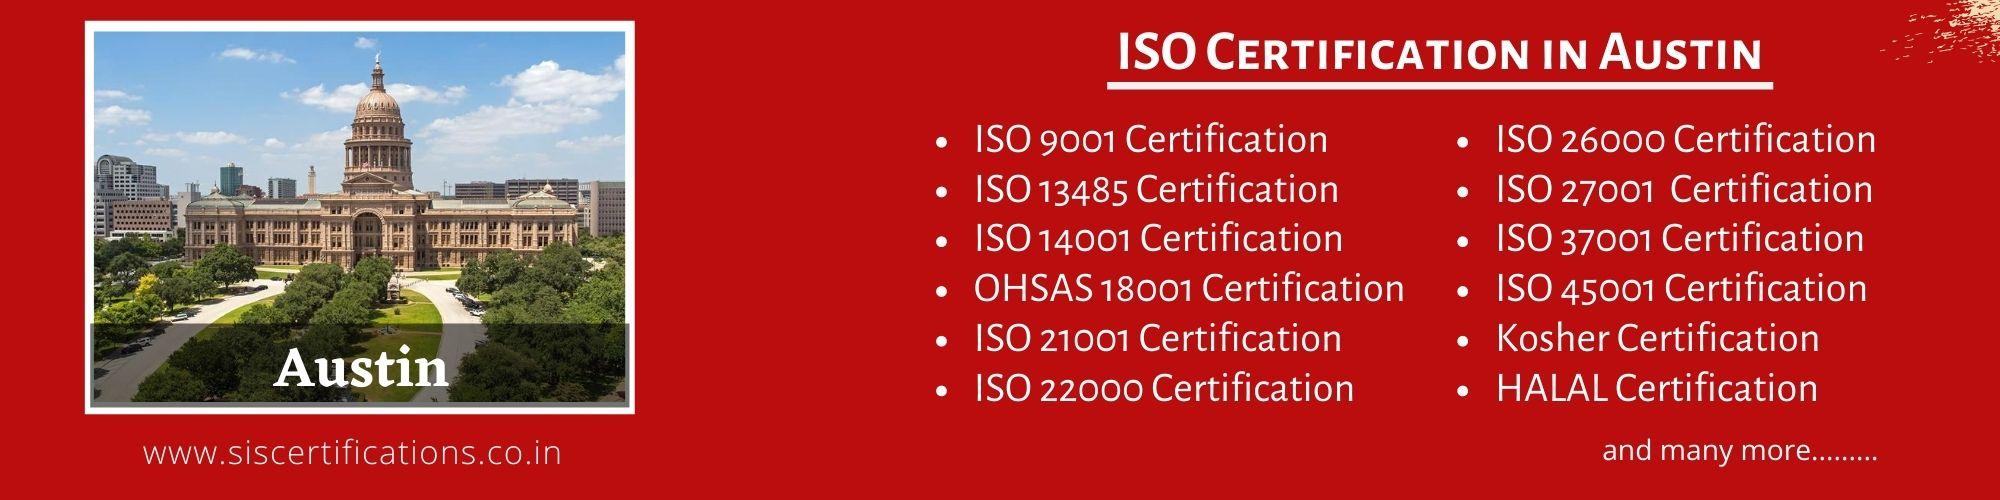 ISO Certification in Austin , ISO Certification in Austin